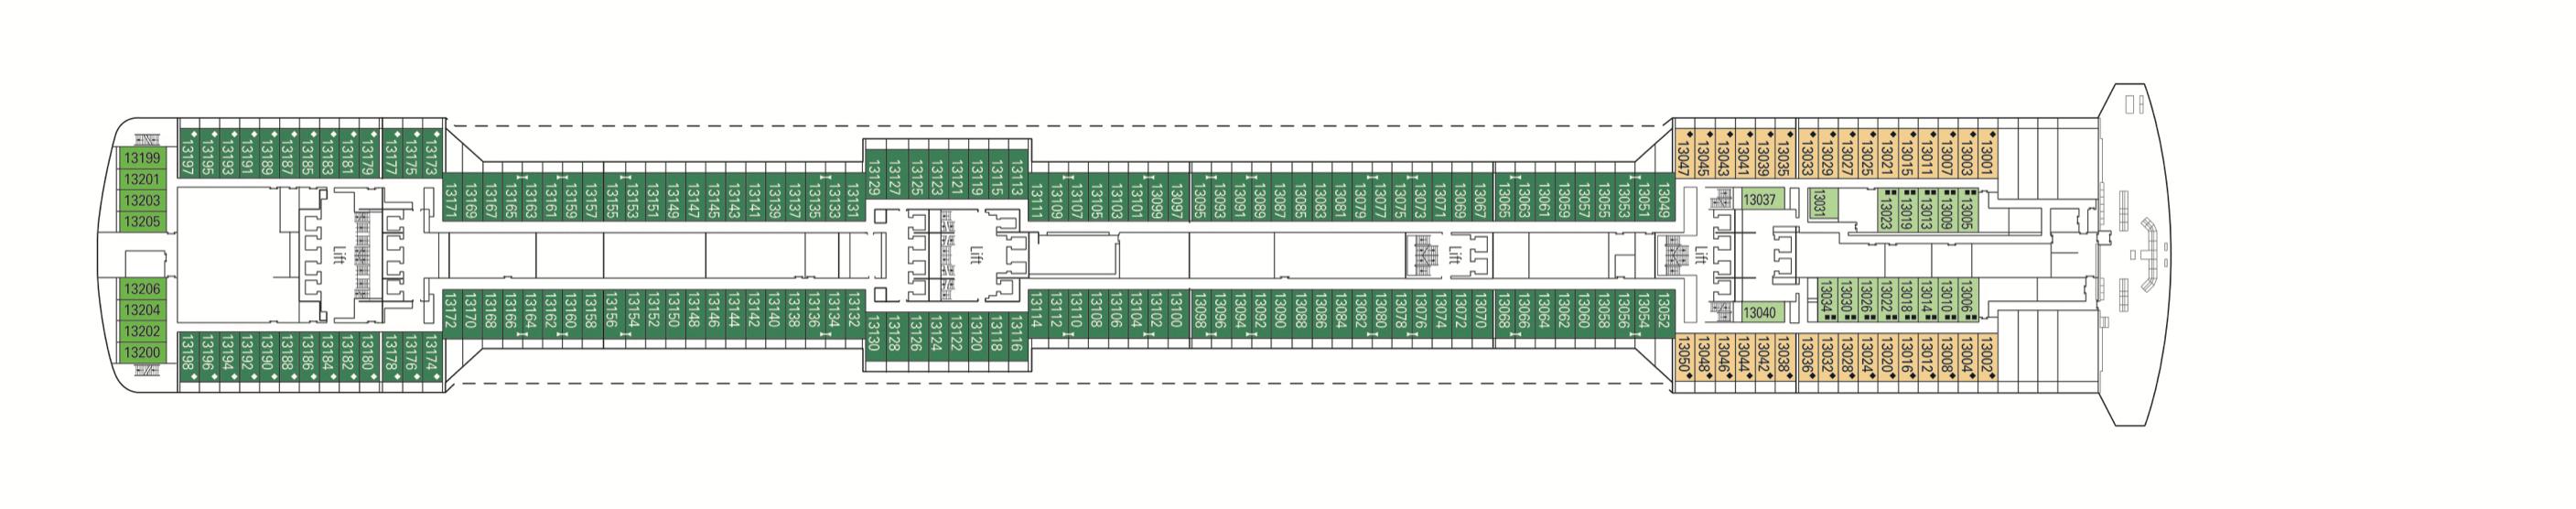 MSC Fantasia Class Splendida Deck 13.jpg